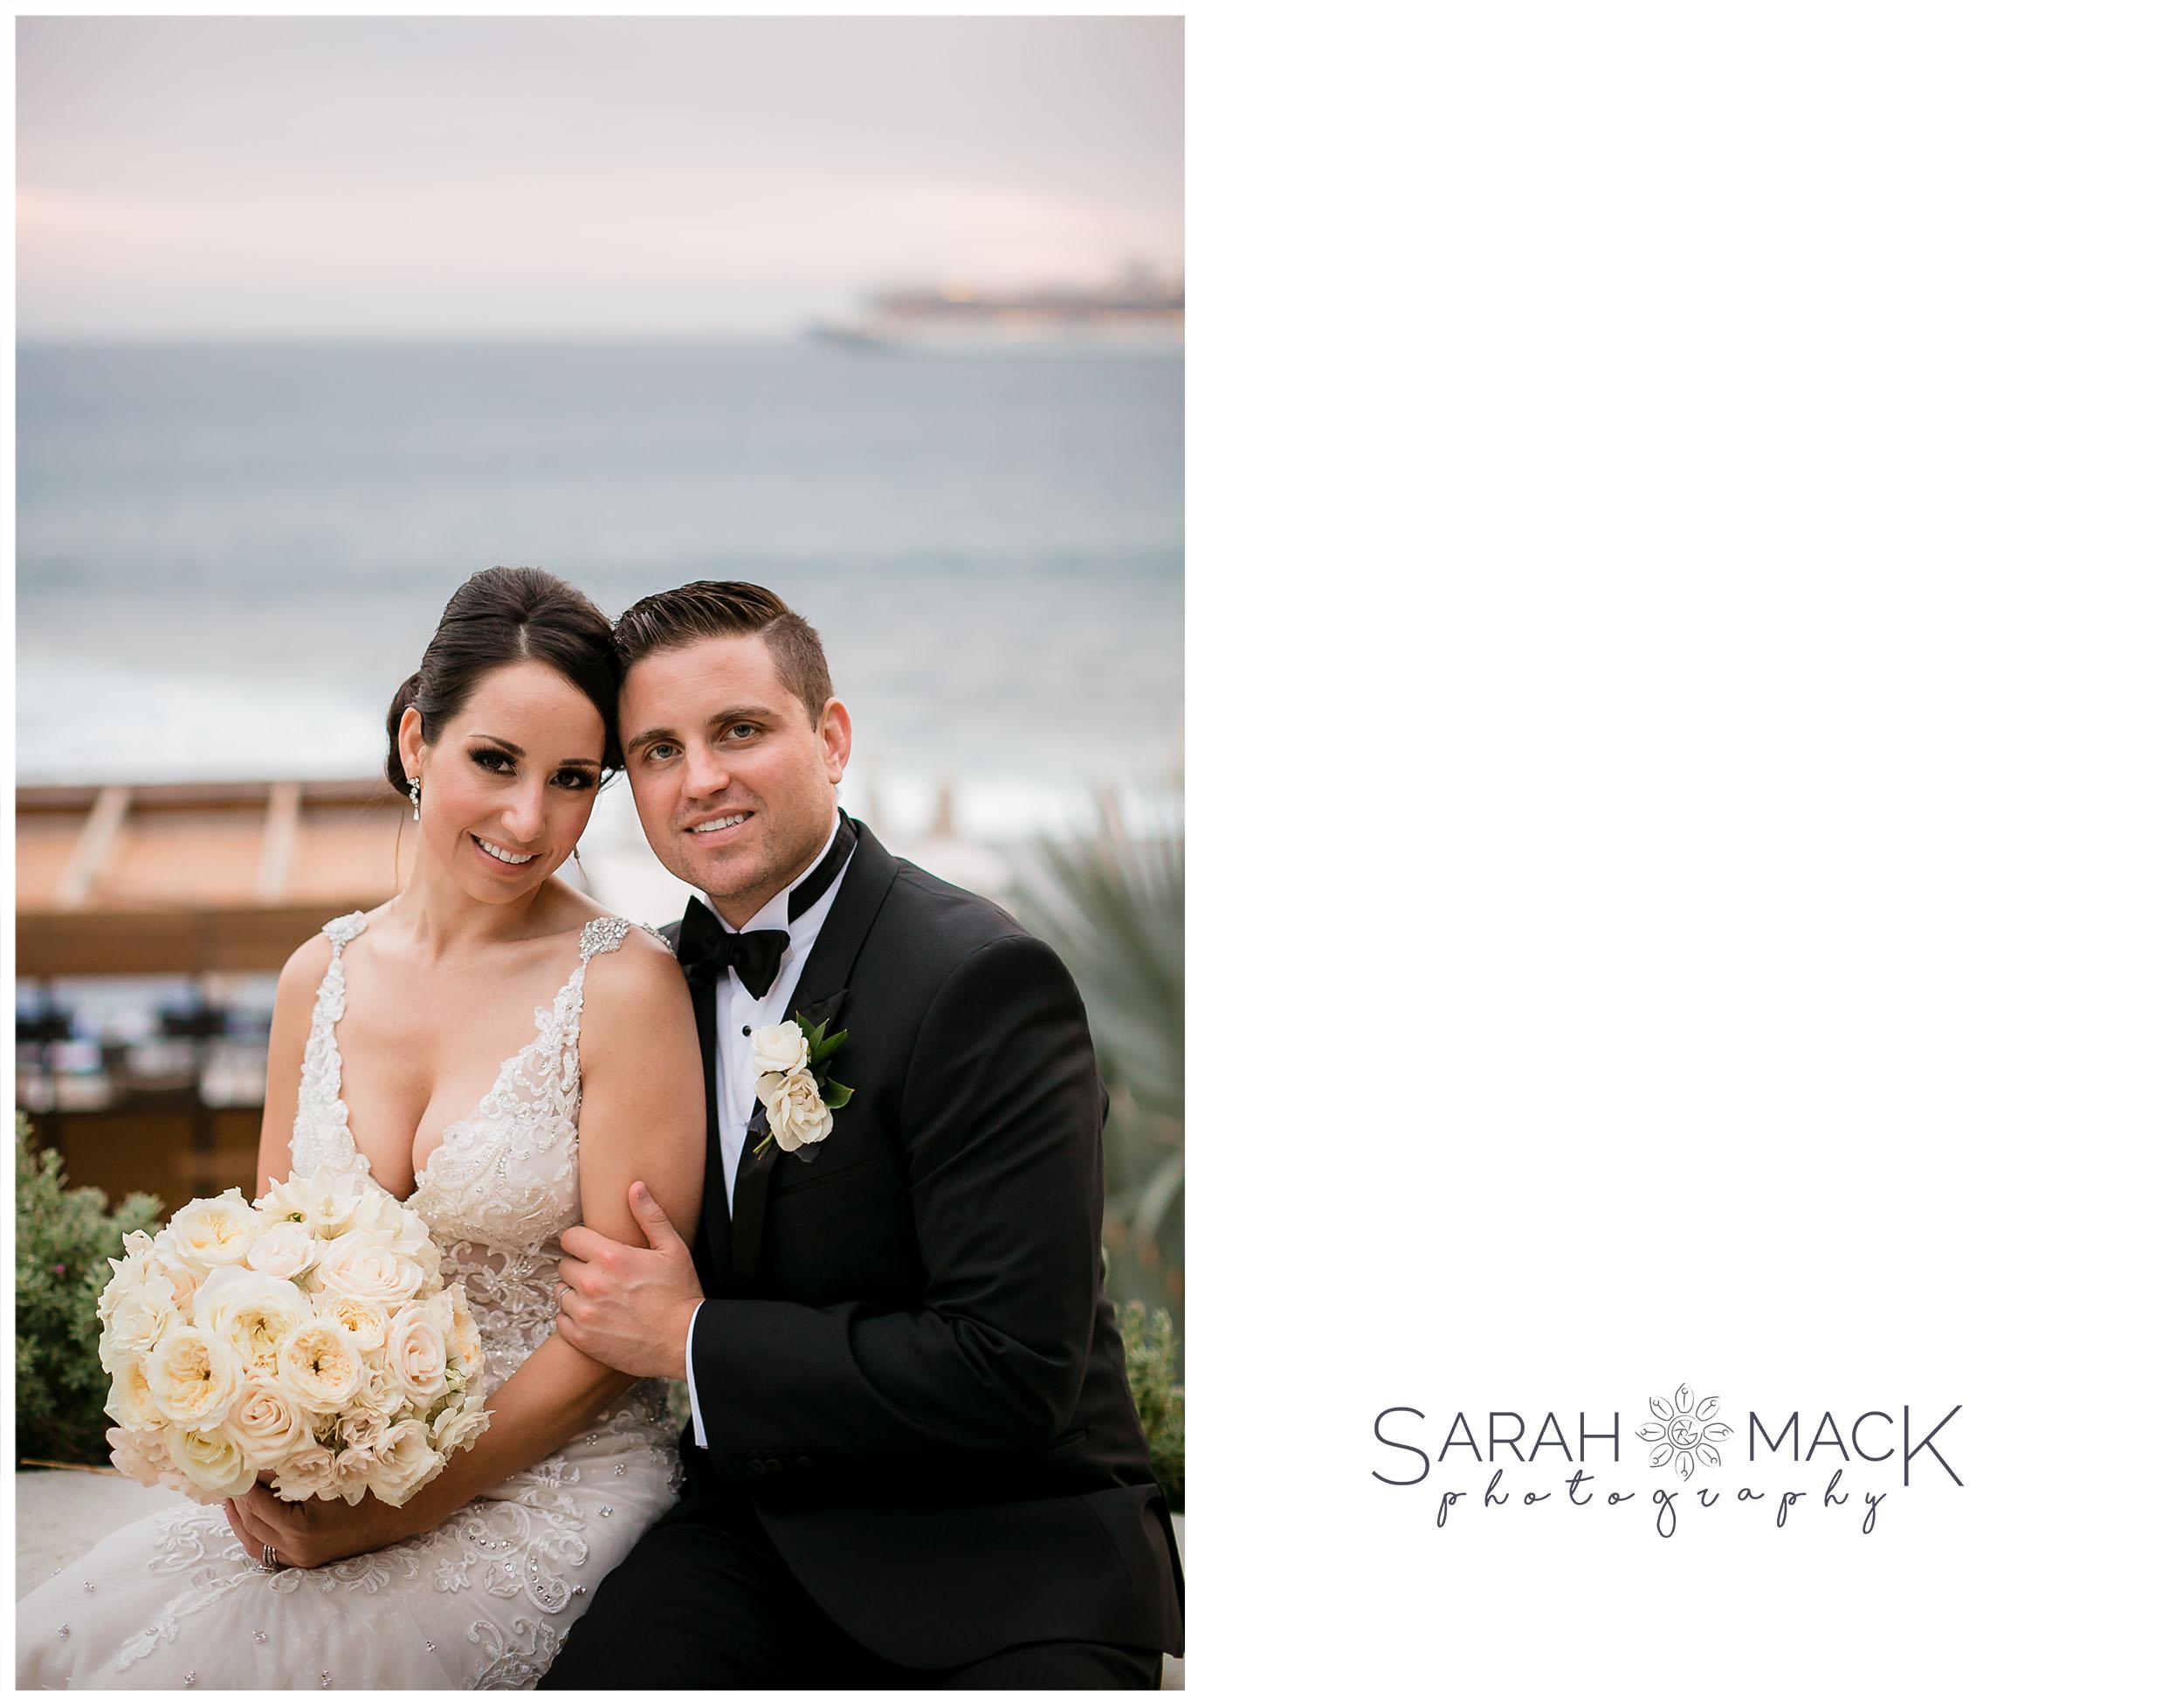 LJ-The-Cape-Hotel-Cabo-San-Lucas-Wedding-37.jpg